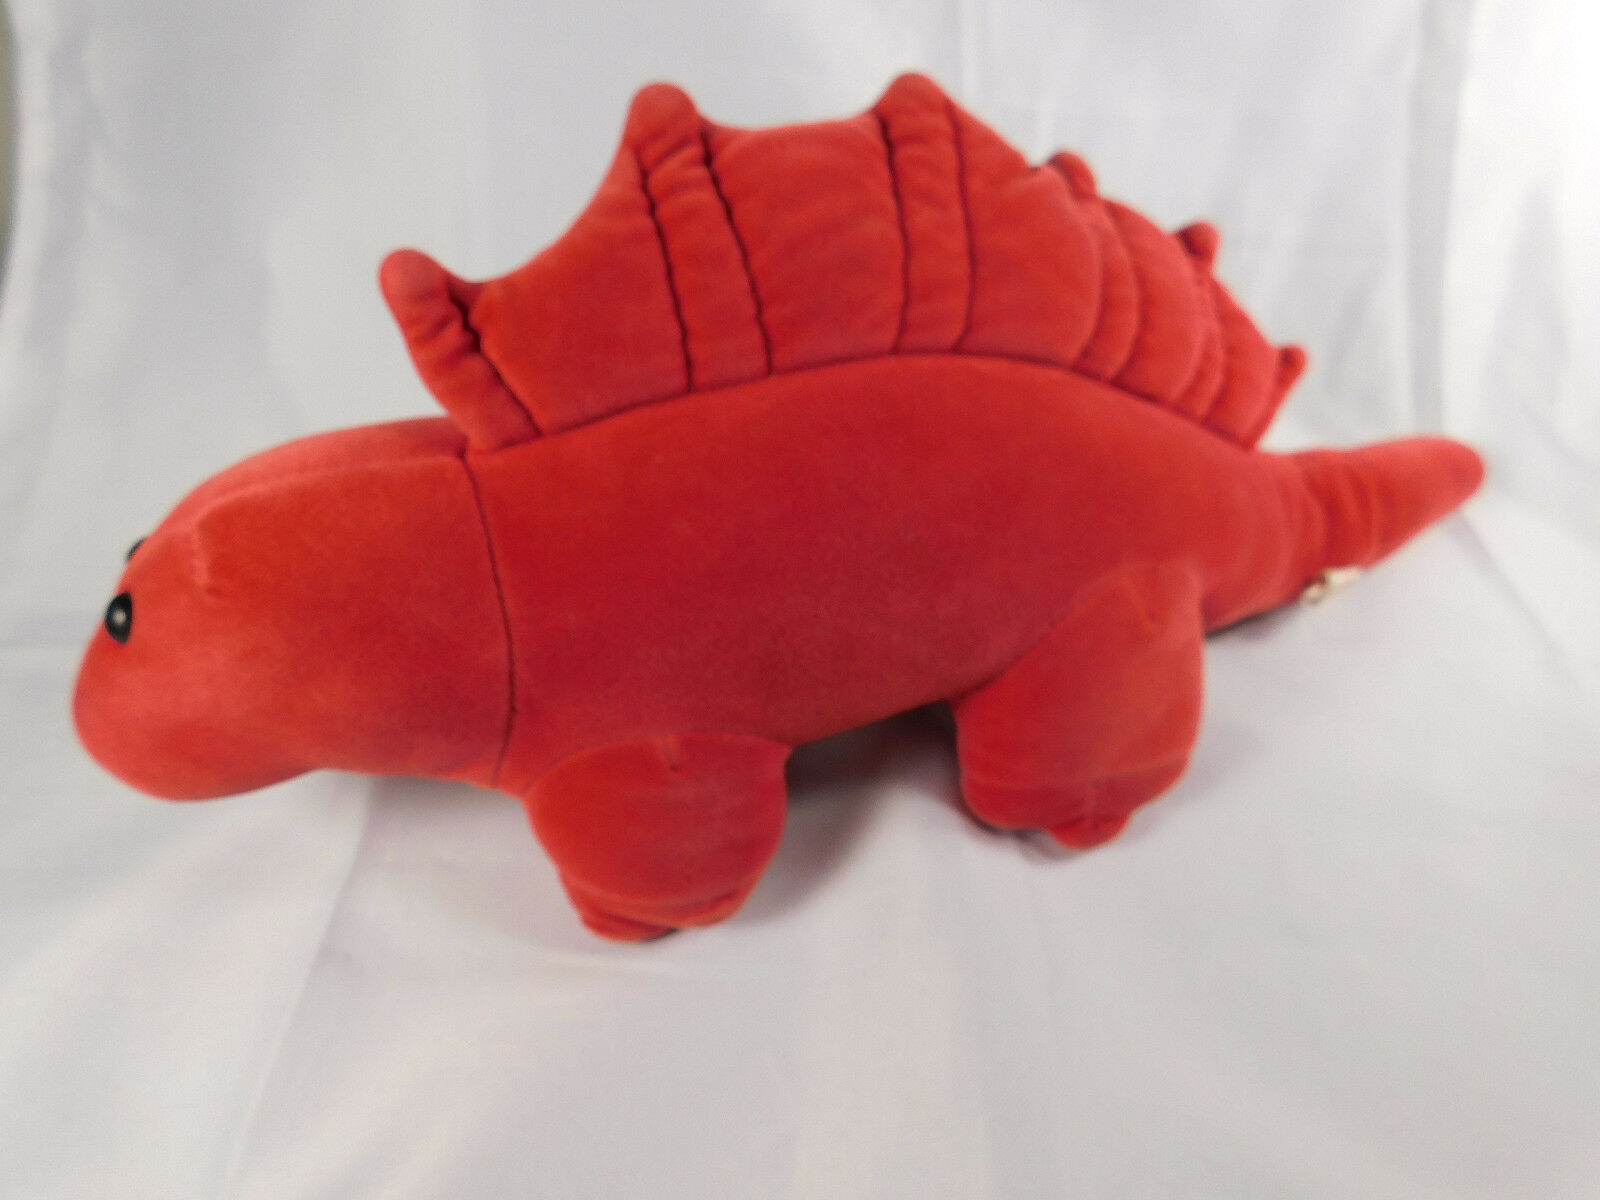 Manhattan Toy Company ROT Dimetrodon Dinosaur 1984 Vintage Plush Toy